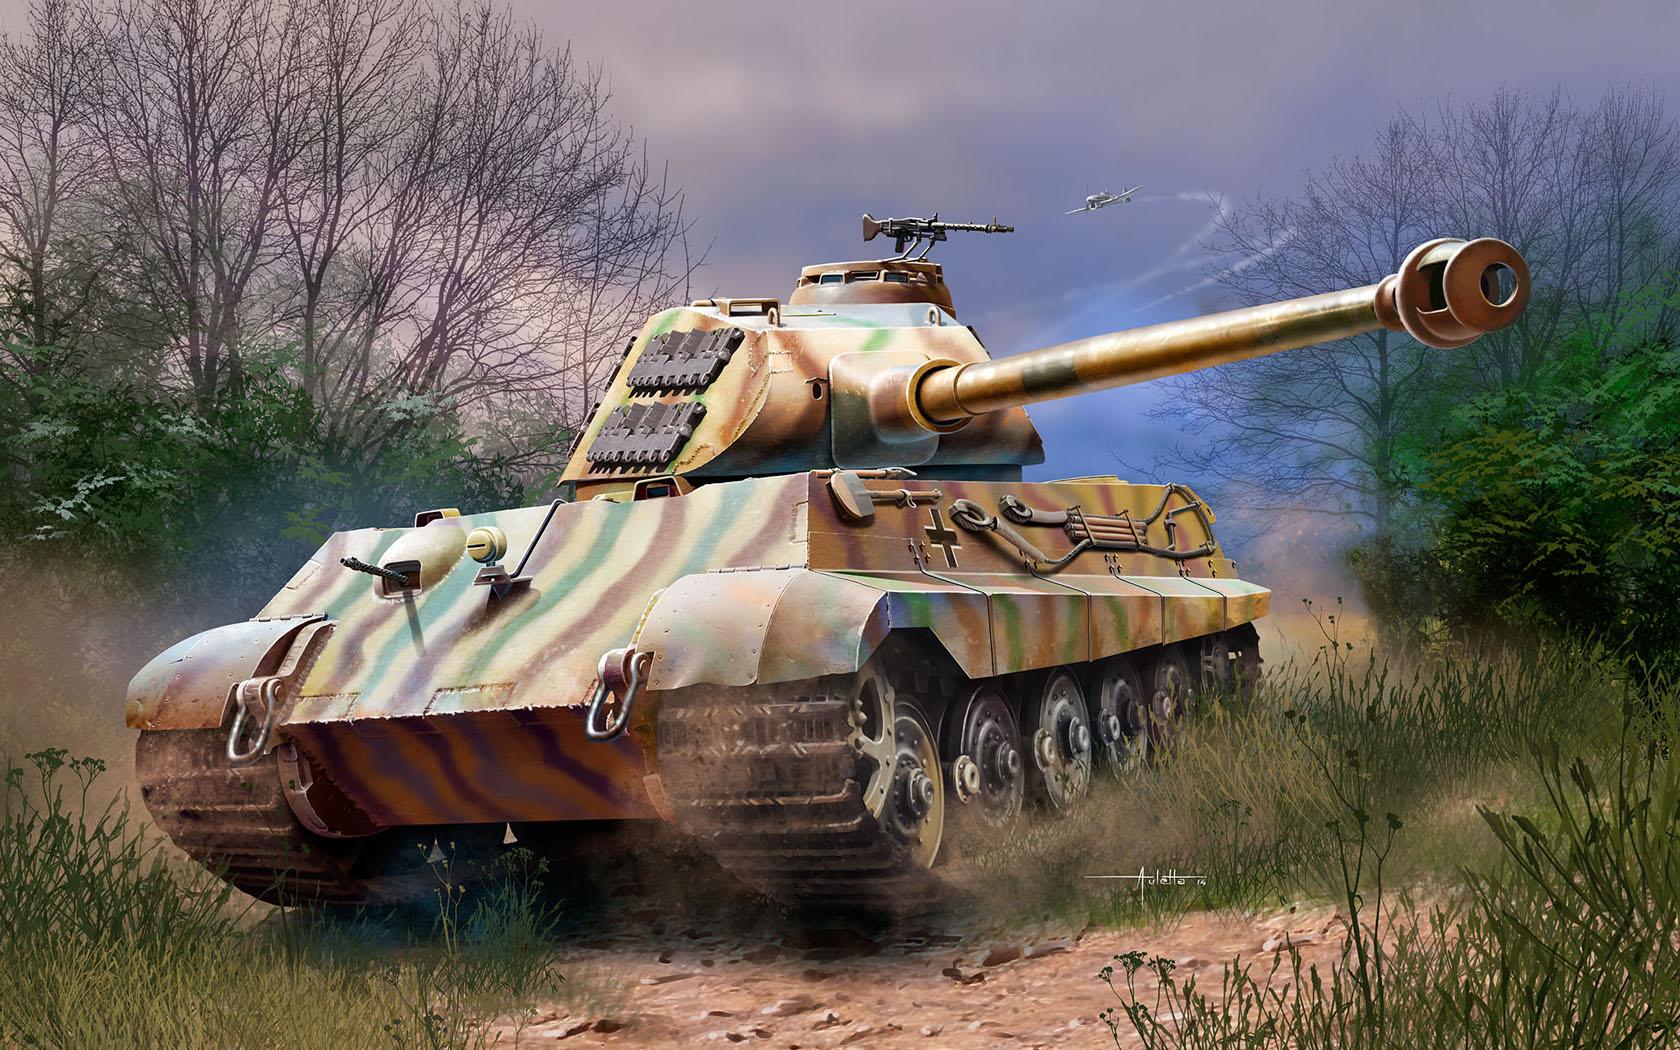 рисунок Немецкий тяжелый танк Pz.Kpfw. VI Ausf. B Tiger II